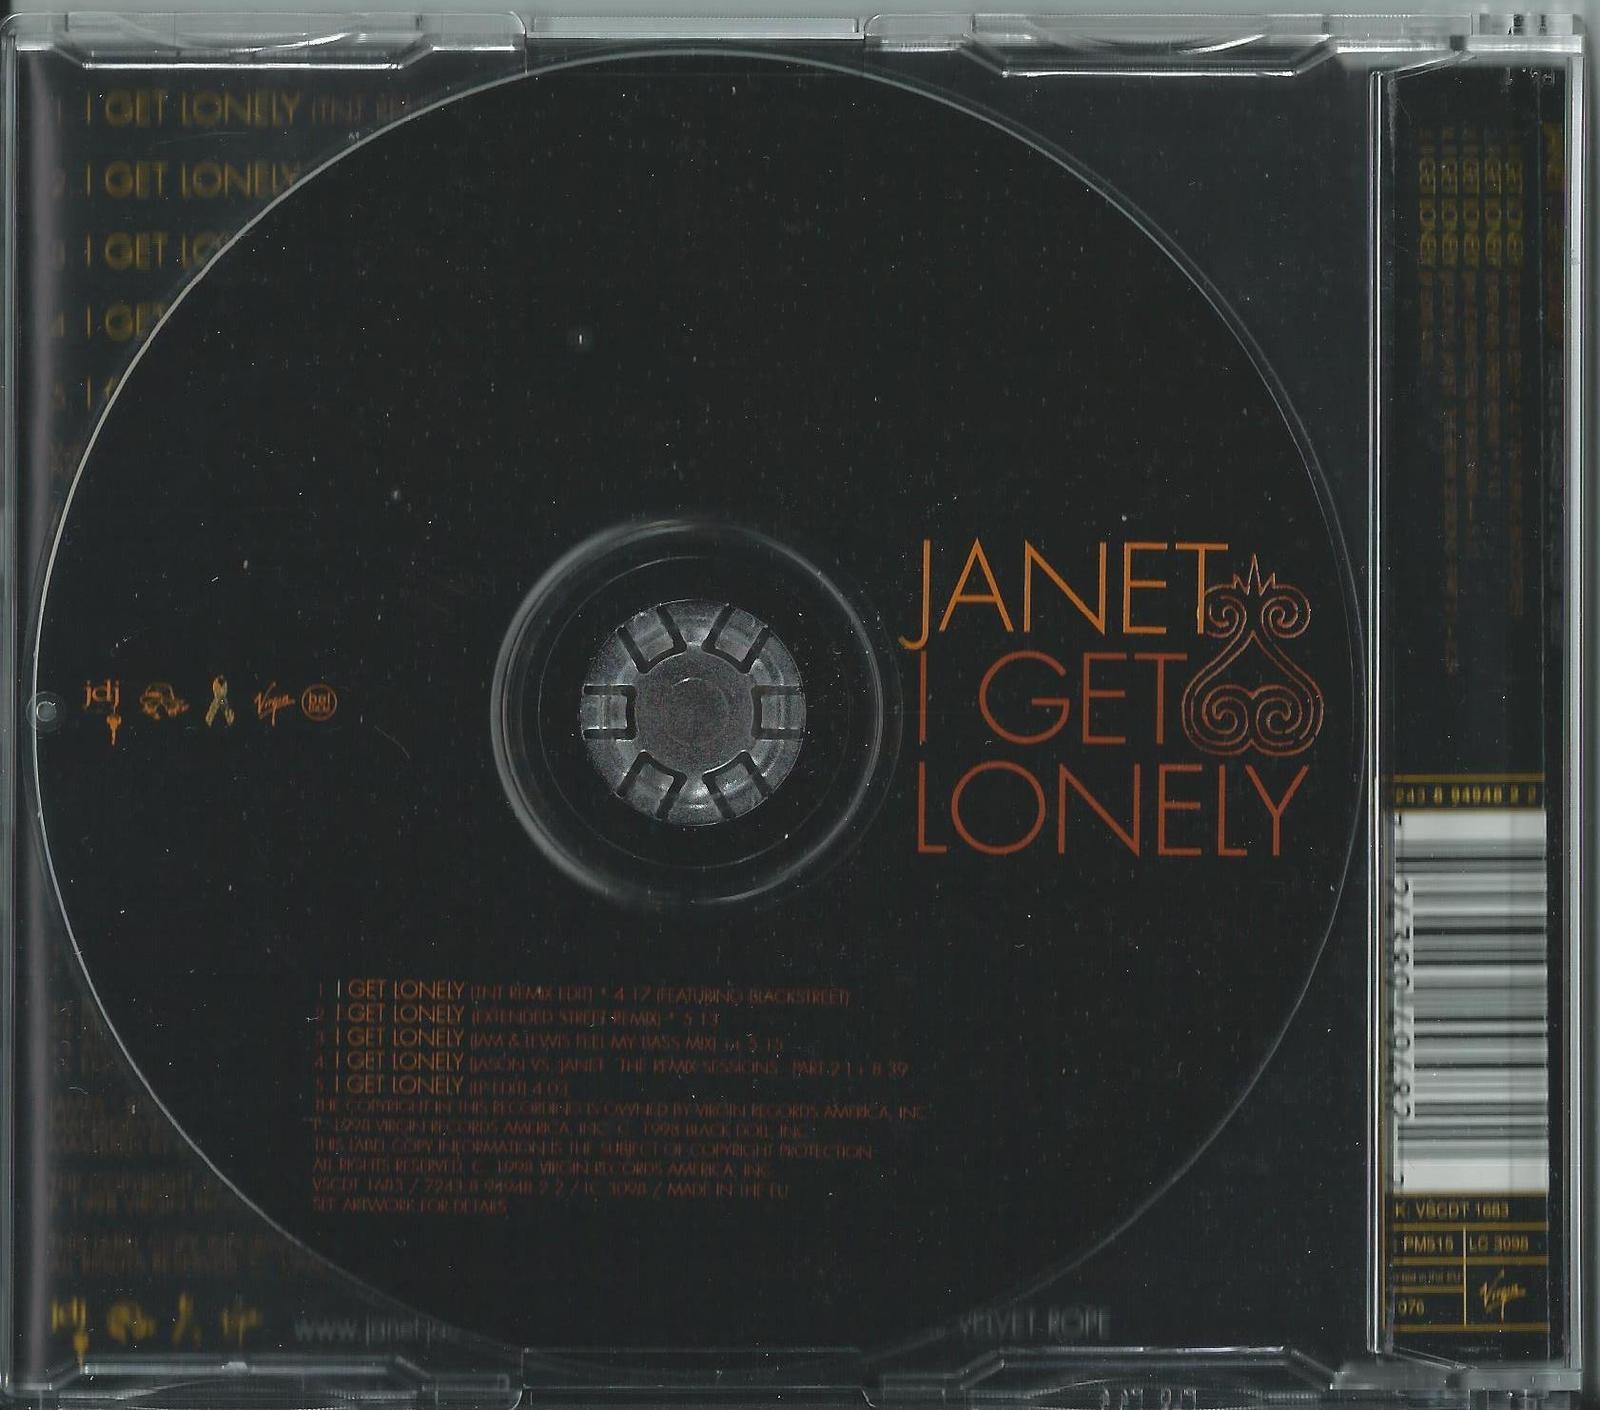 JANET JACKSON - I GET LONELY / (REMIXES) 2005 UK 5 TRACK CD SINGLE VSCDT 1683